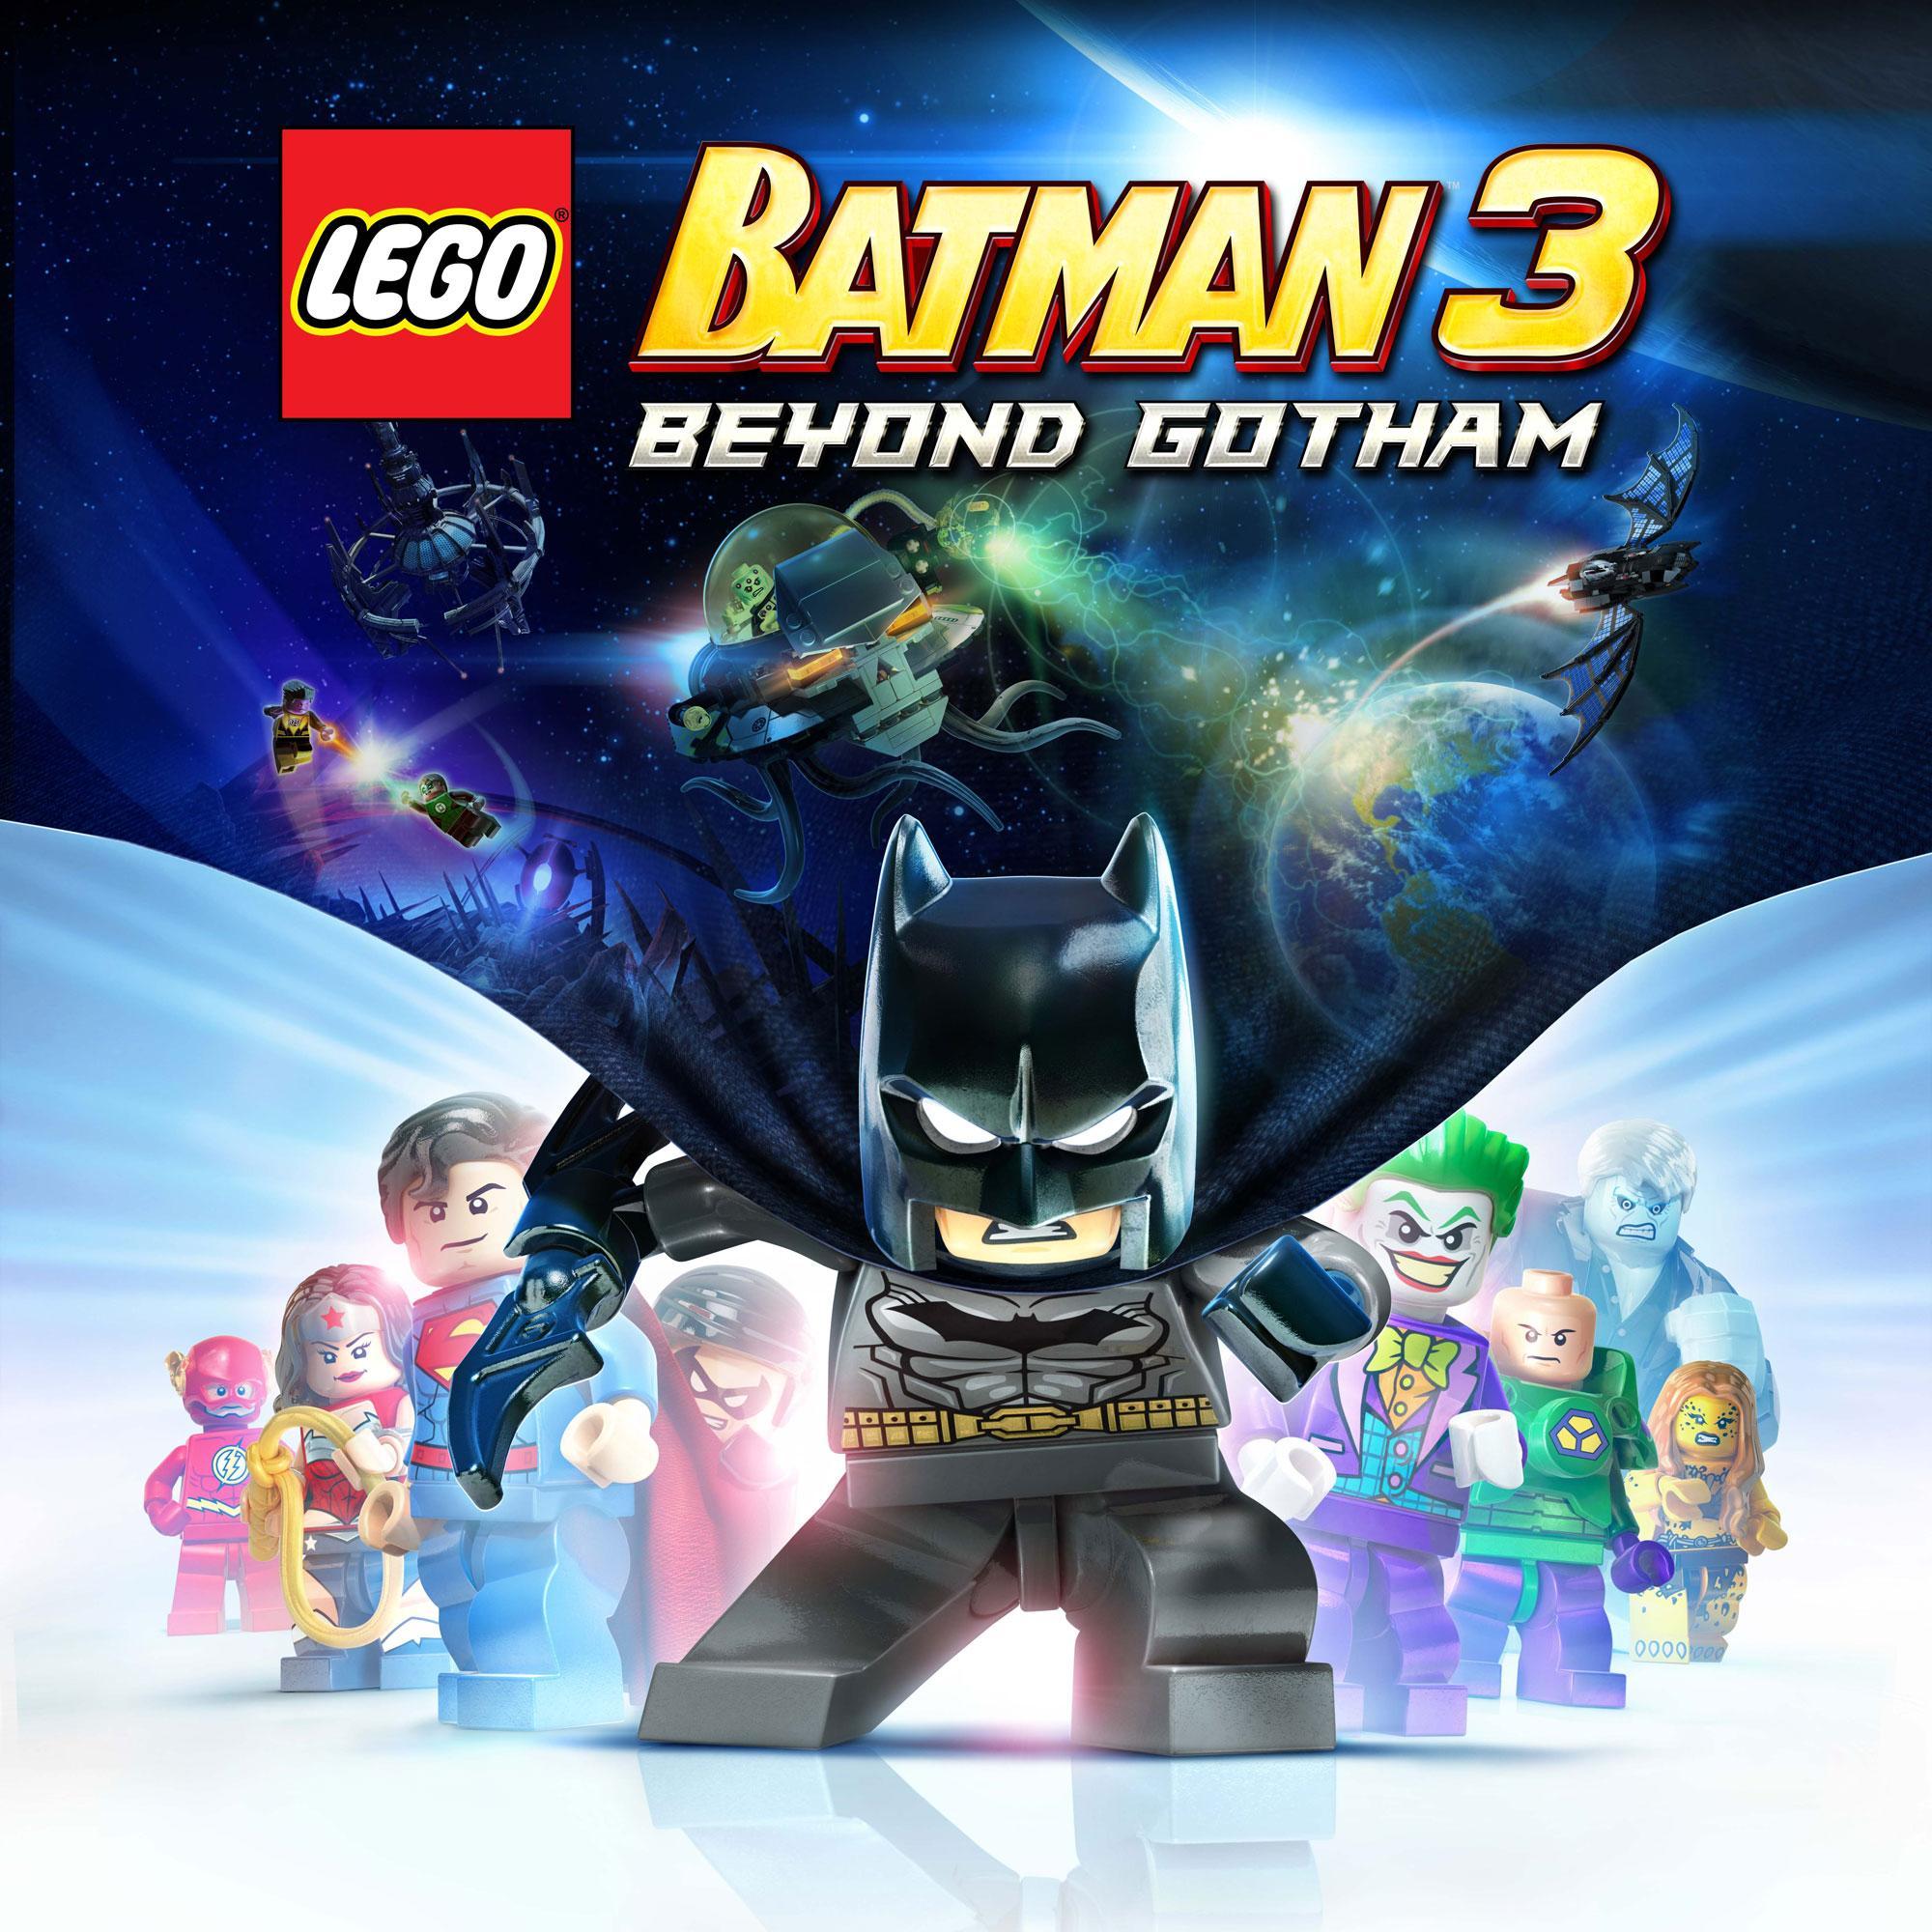 LEGO Batman 3: Beyond Gotham (Xbox 360): Amazon.co.uk: PC